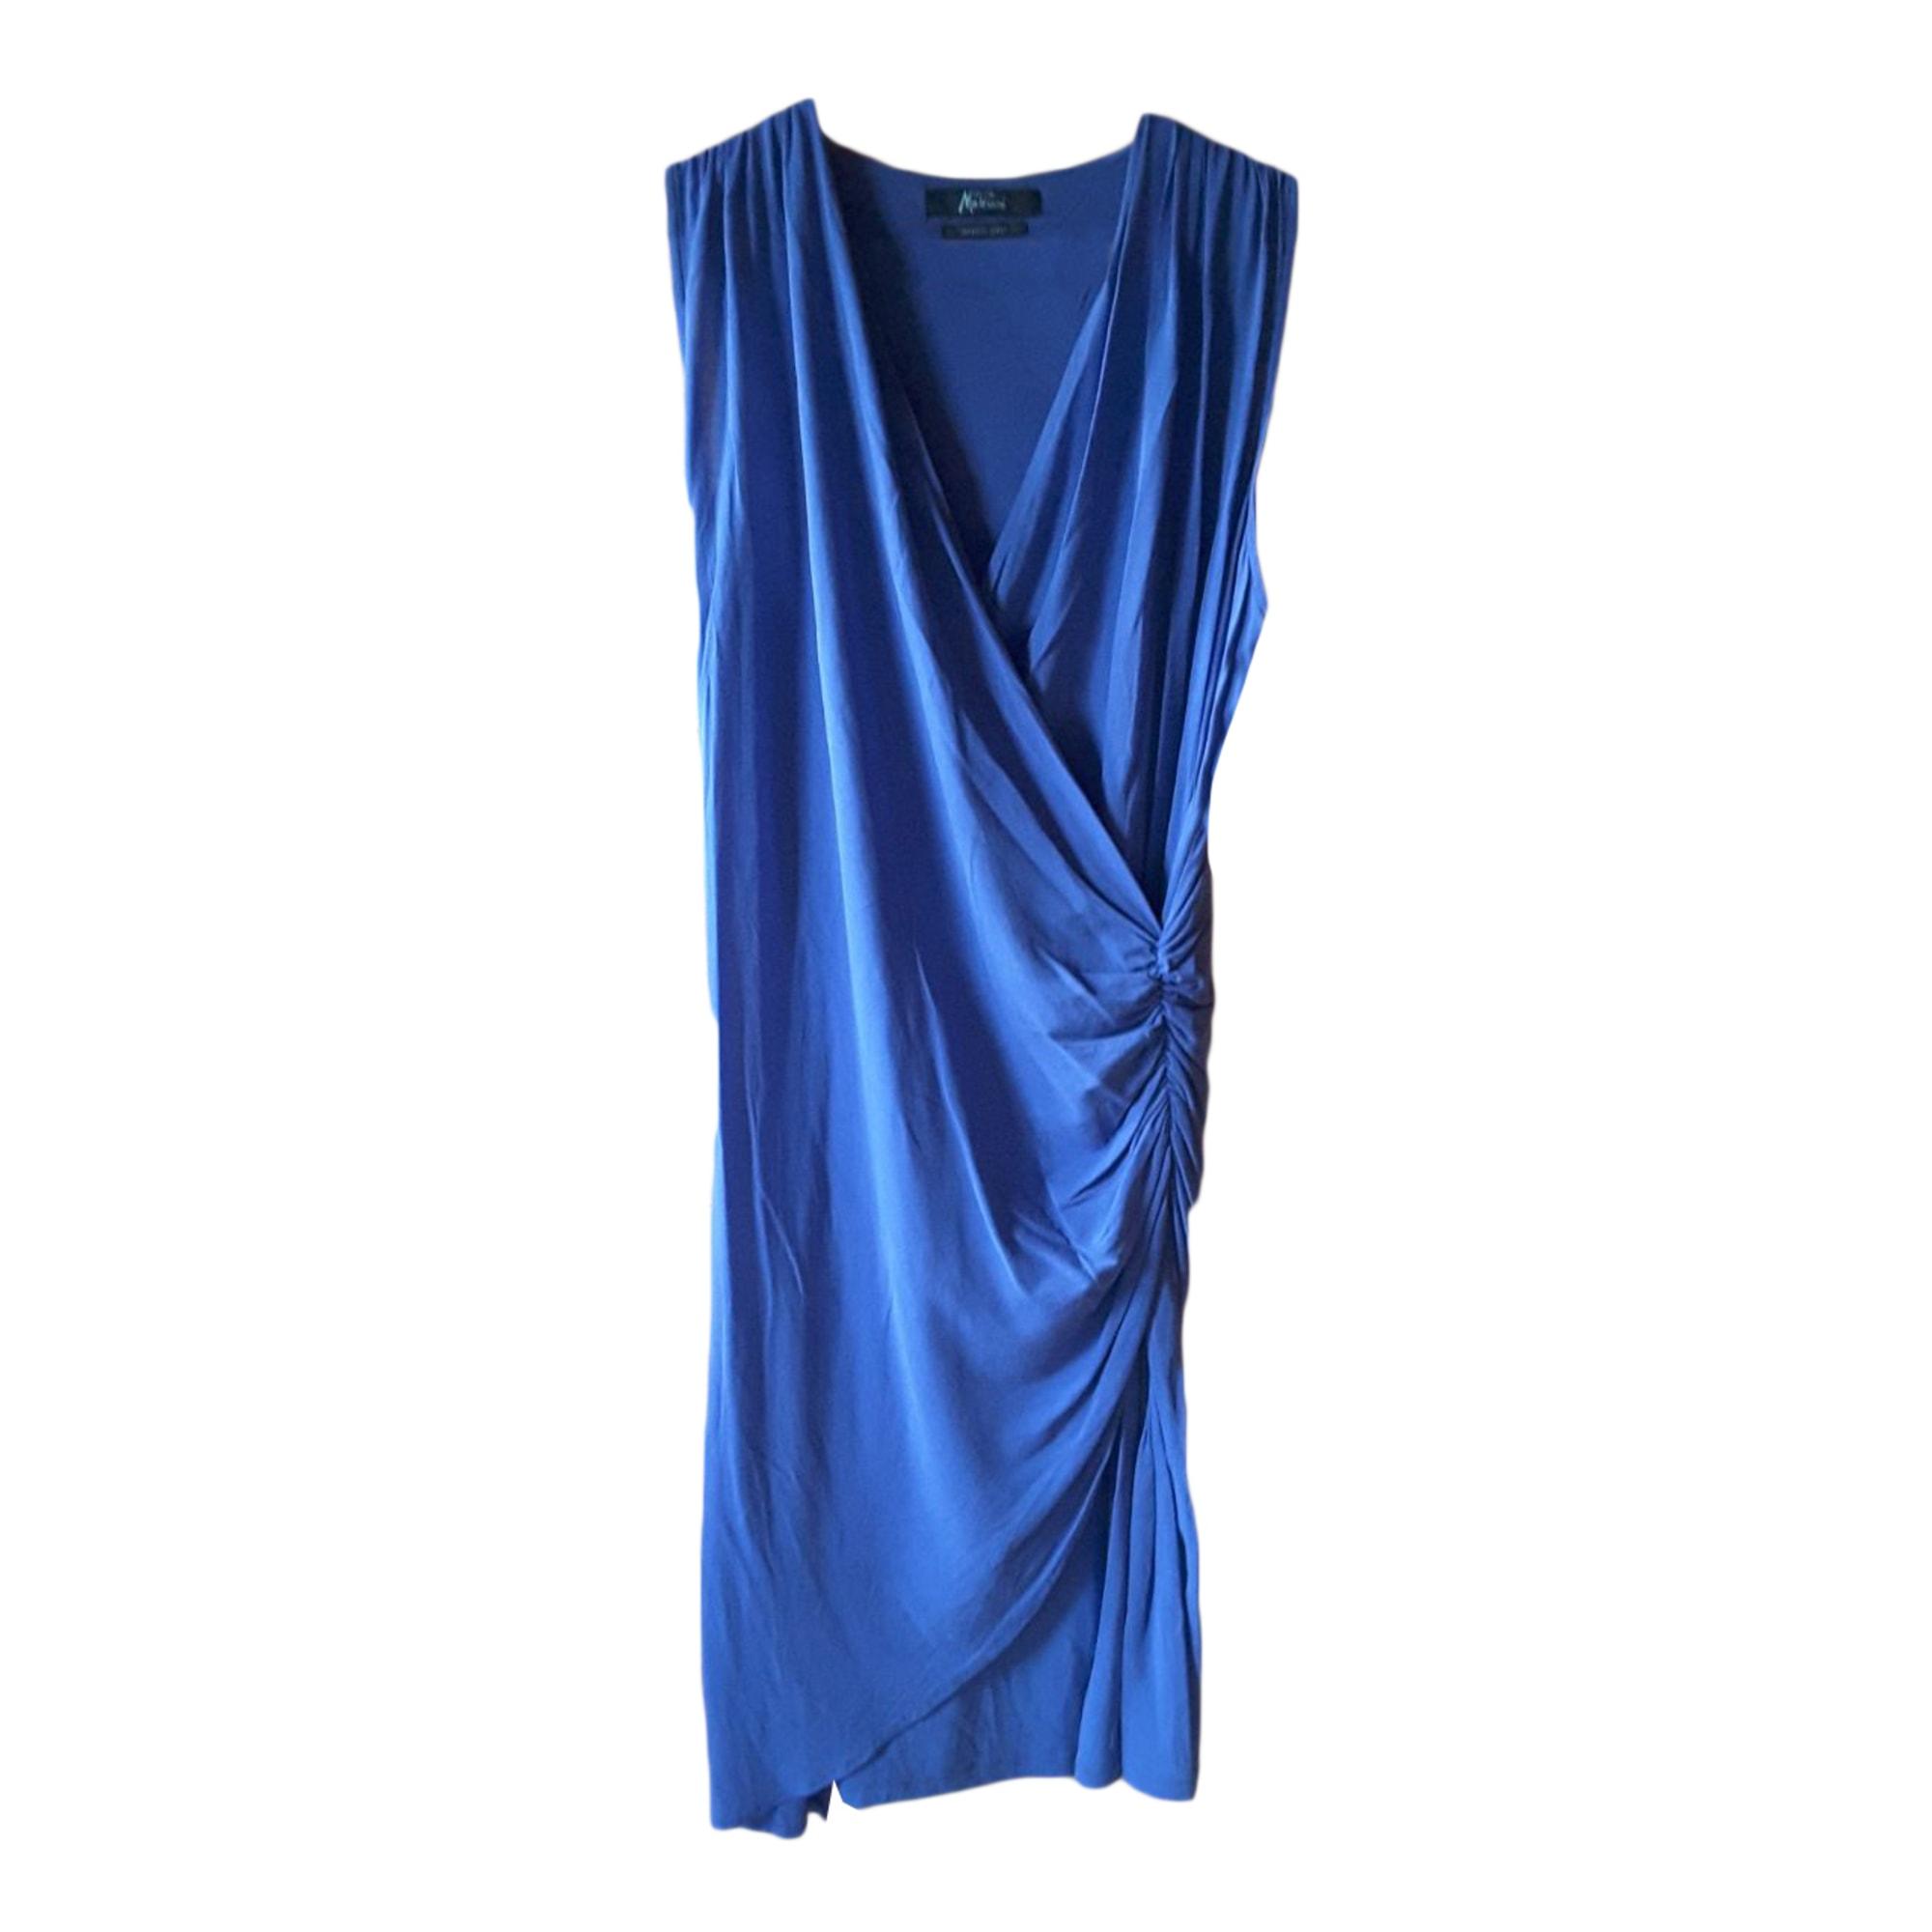 Robe mi-longue GUESS Bleu, bleu marine, bleu turquoise